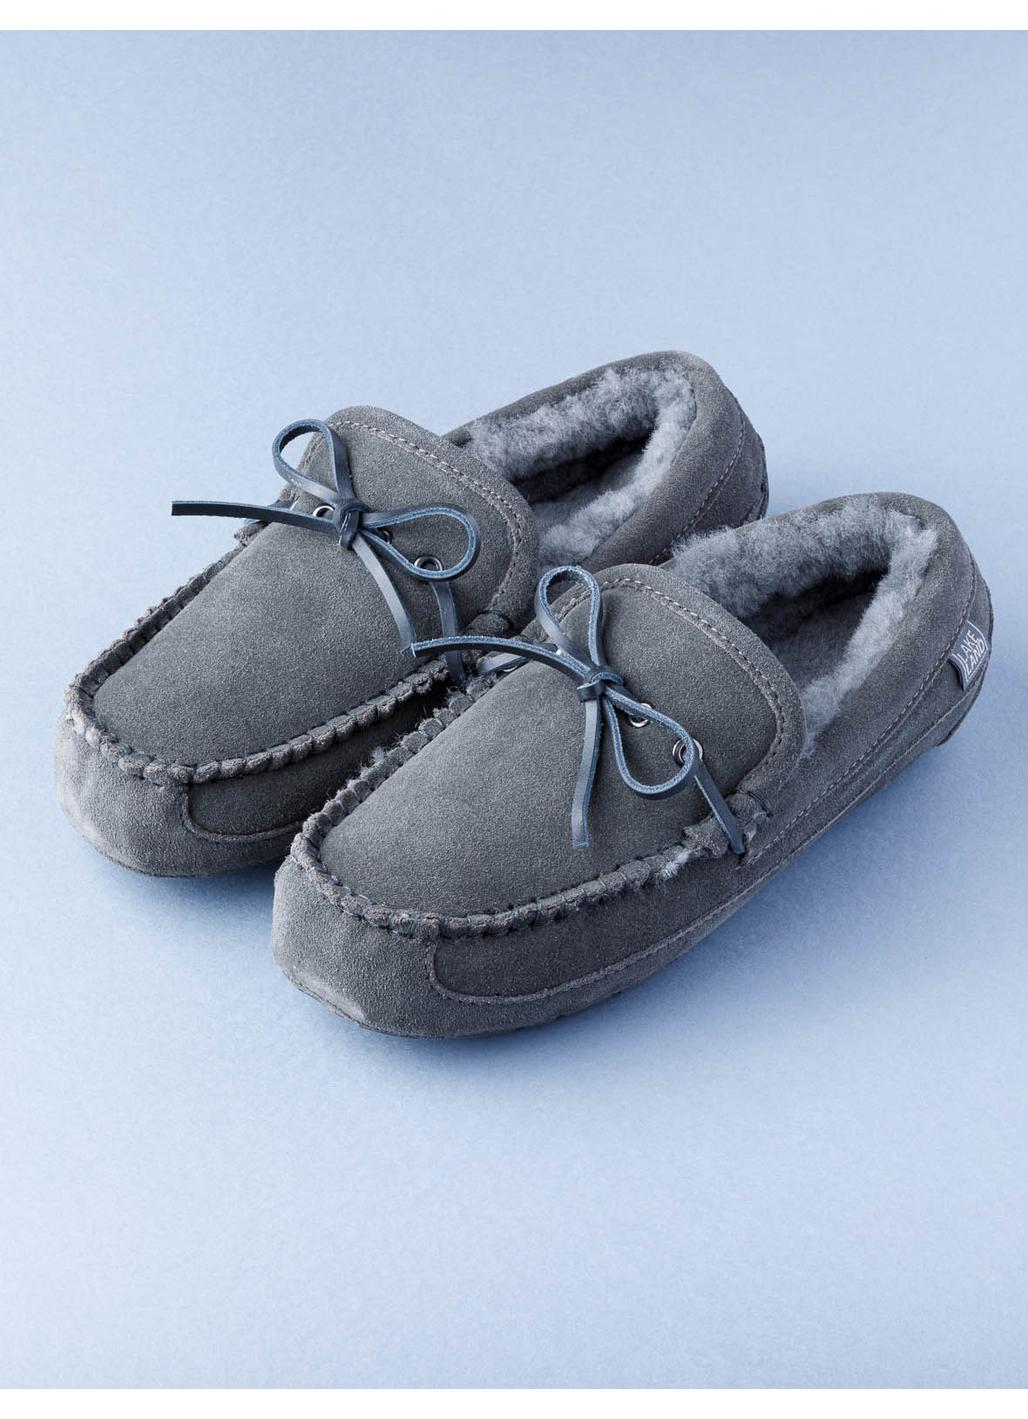 Men's Sheepskin Moccasin Slippers in Grey